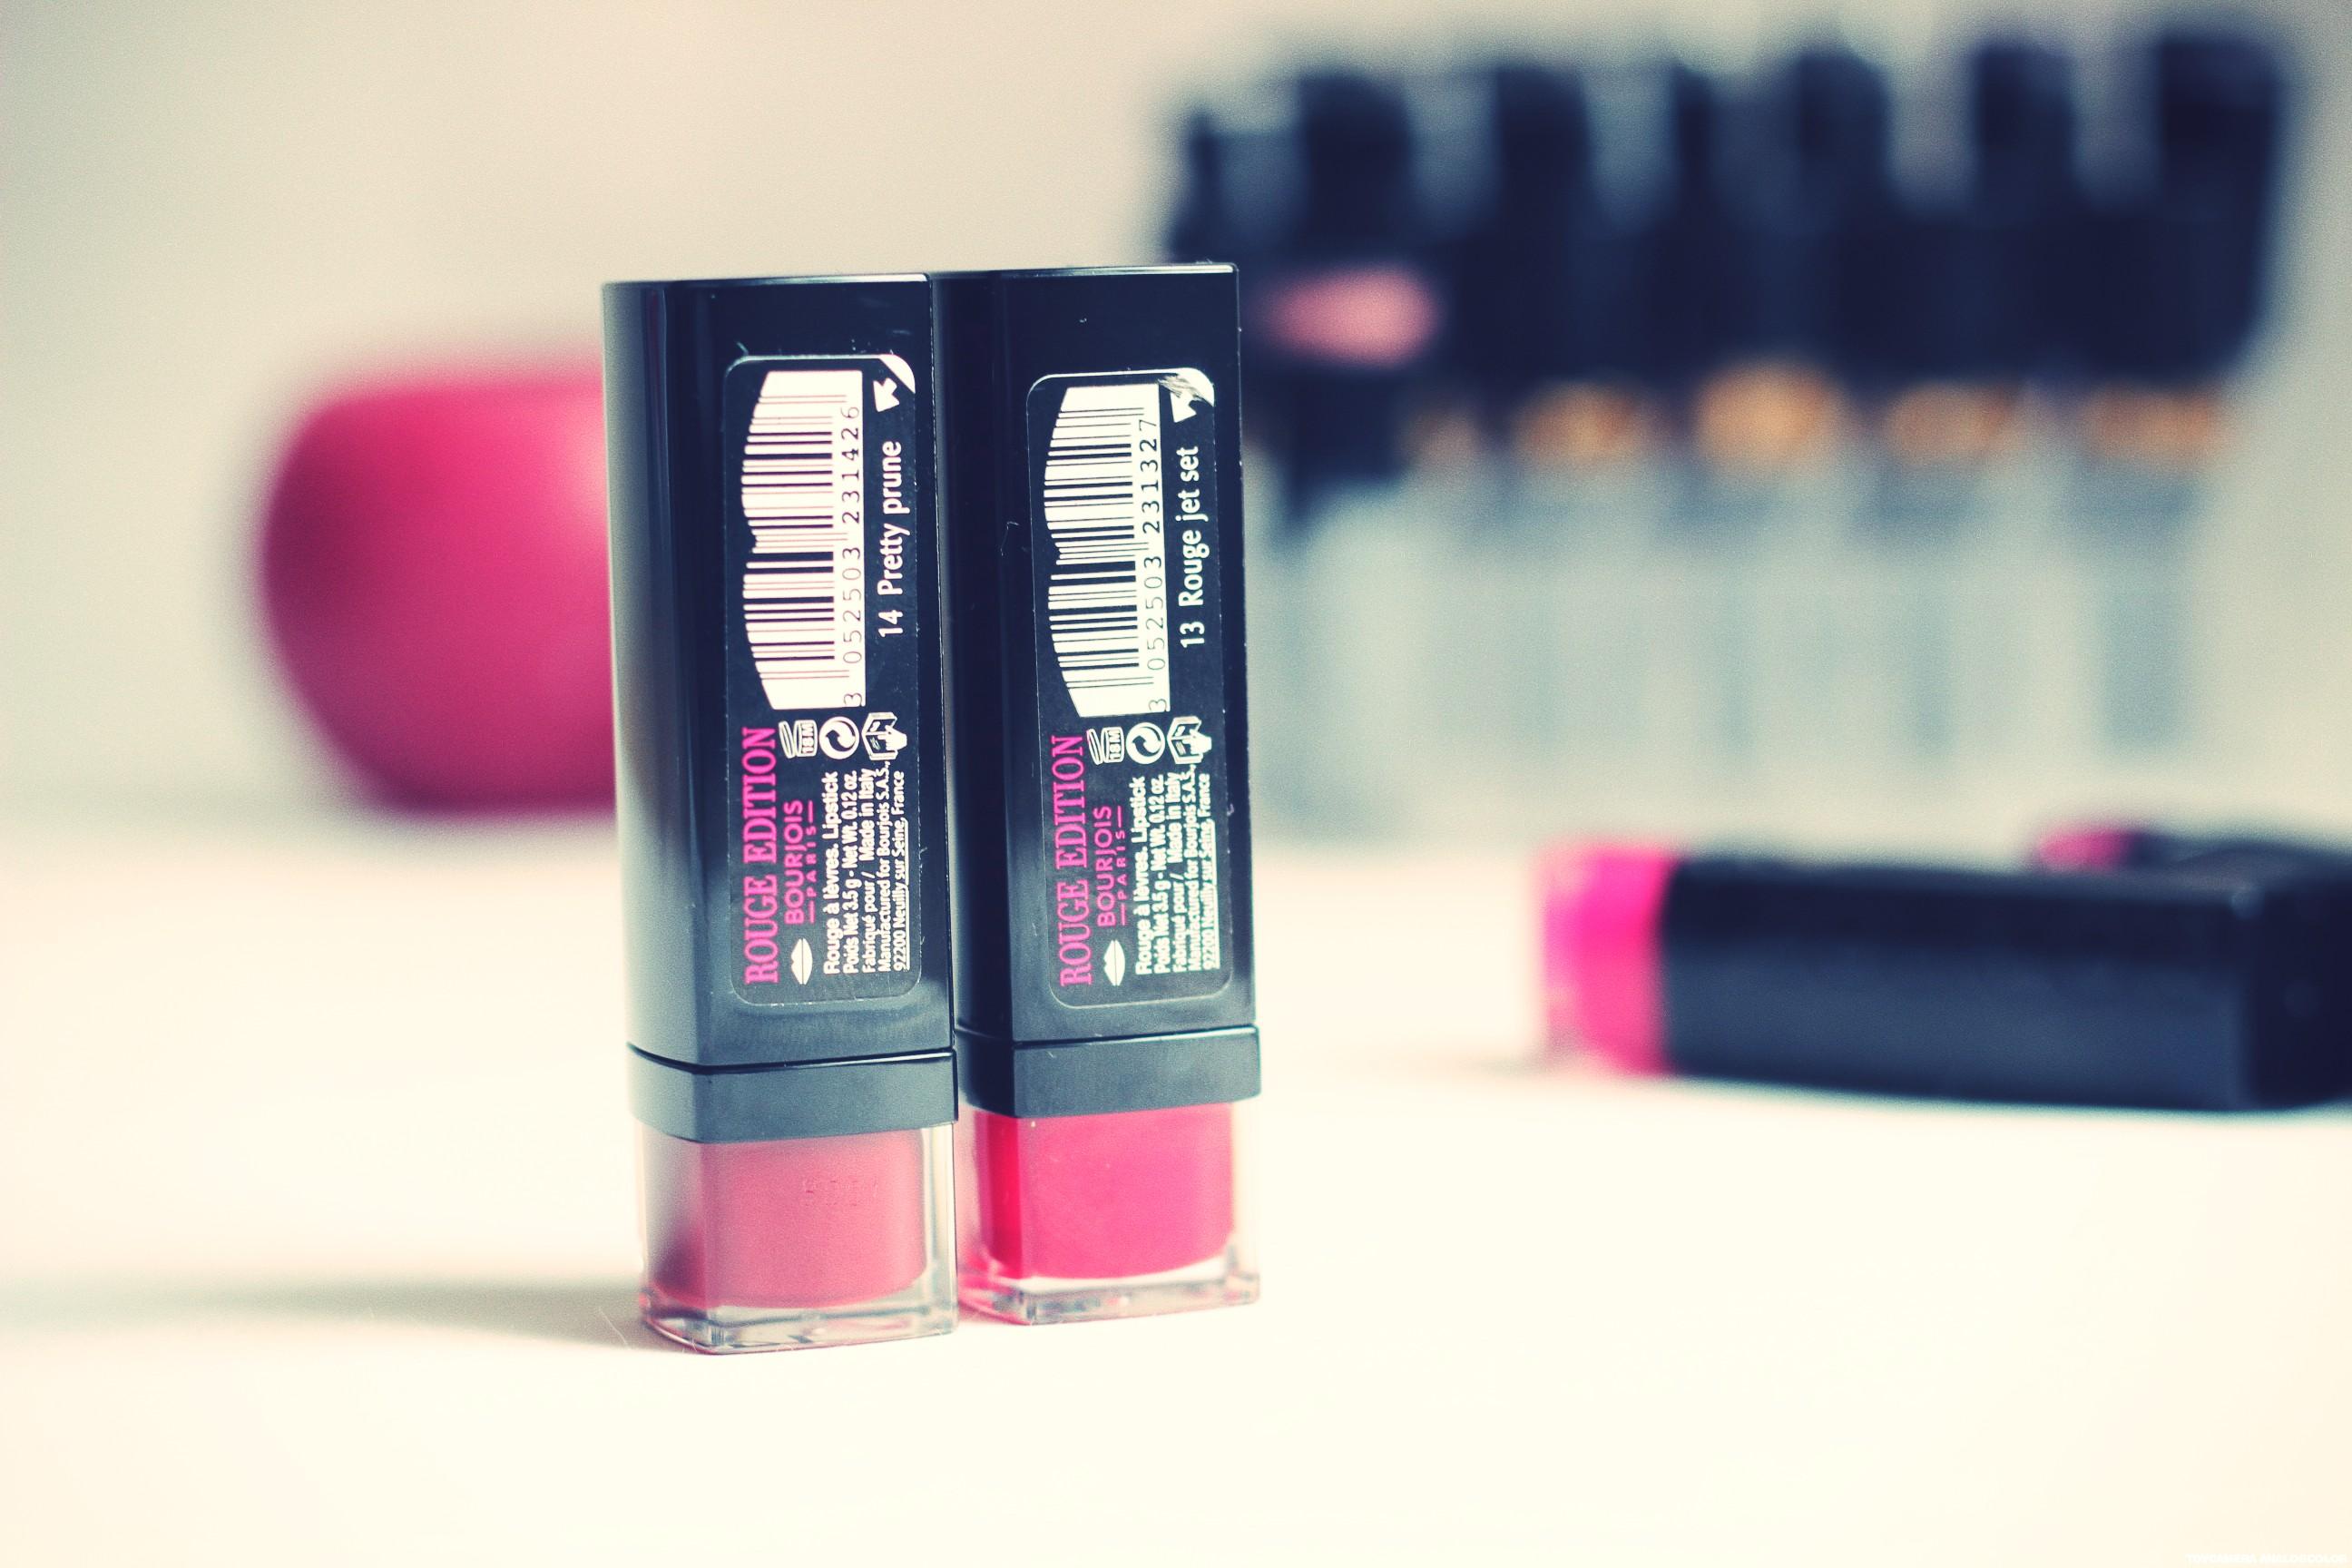 nunaavane-bblogger-beauty-finds-bourjois-rouge-edition-lipsticks-ctbb6